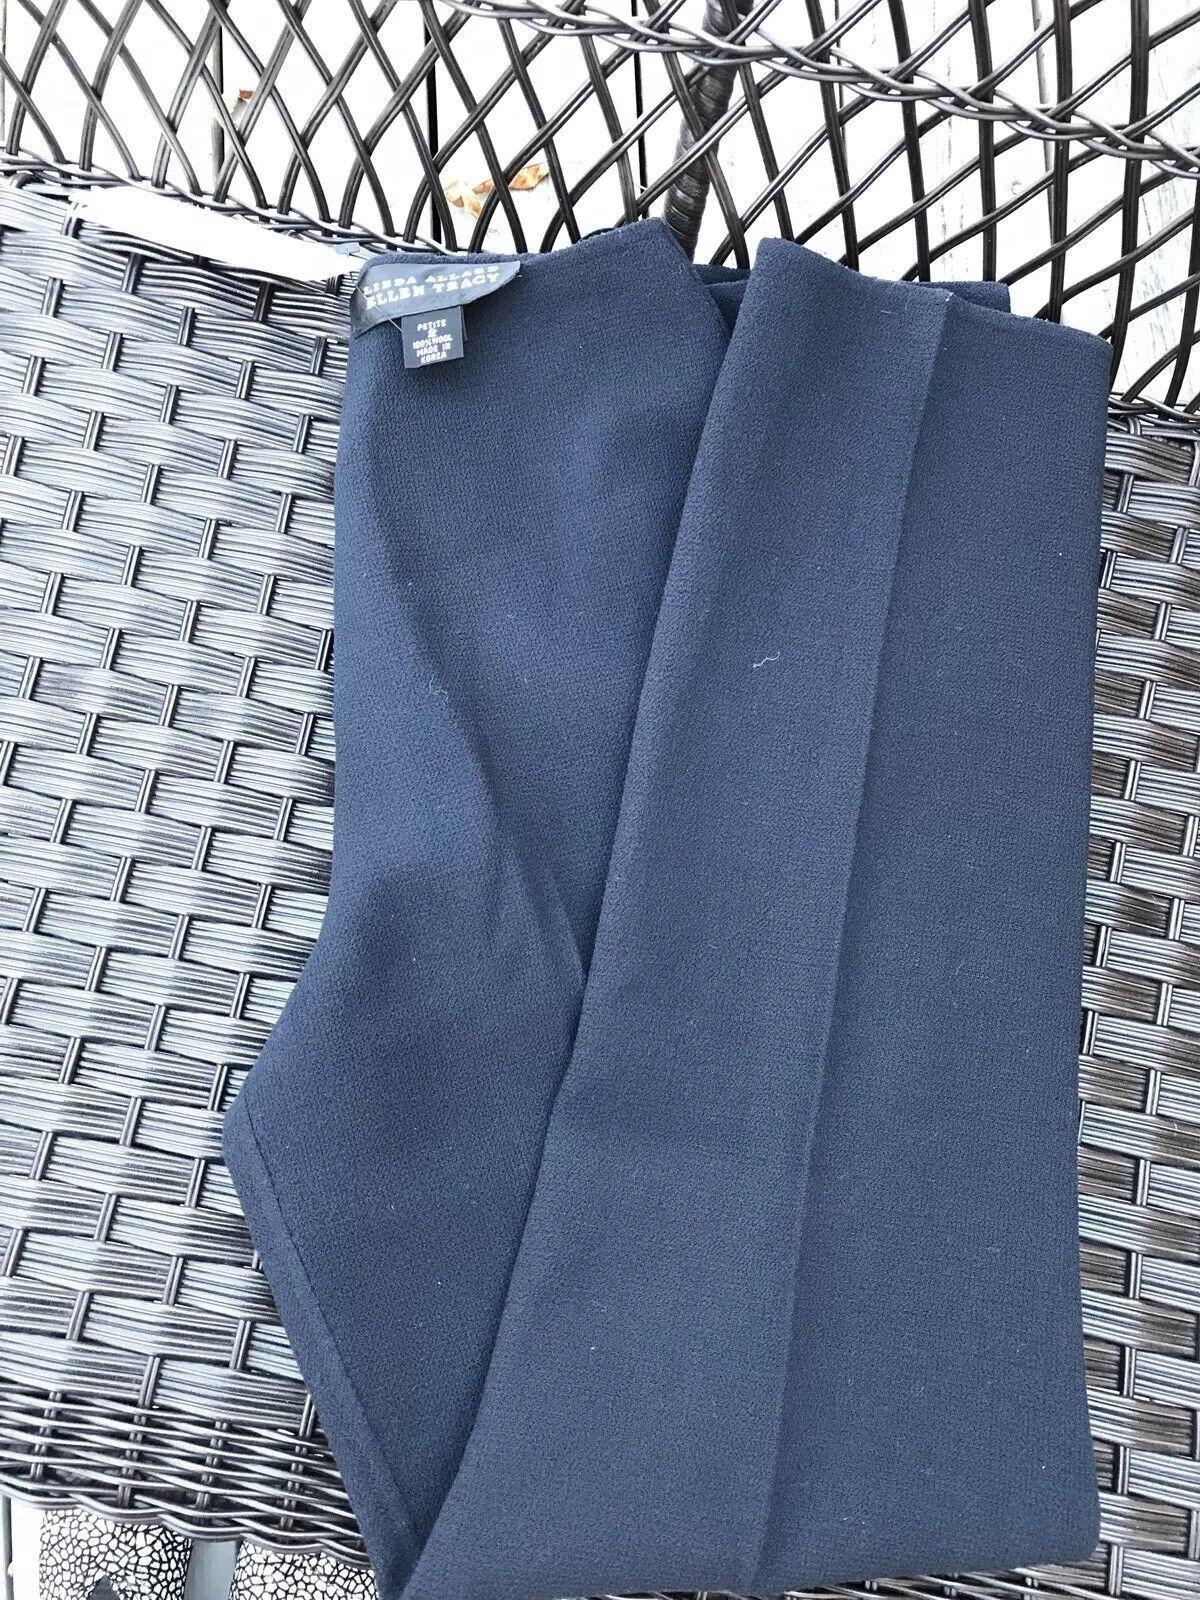 New Linda Alard Ellen Tracy pants 2p petite 100% wool navy   355